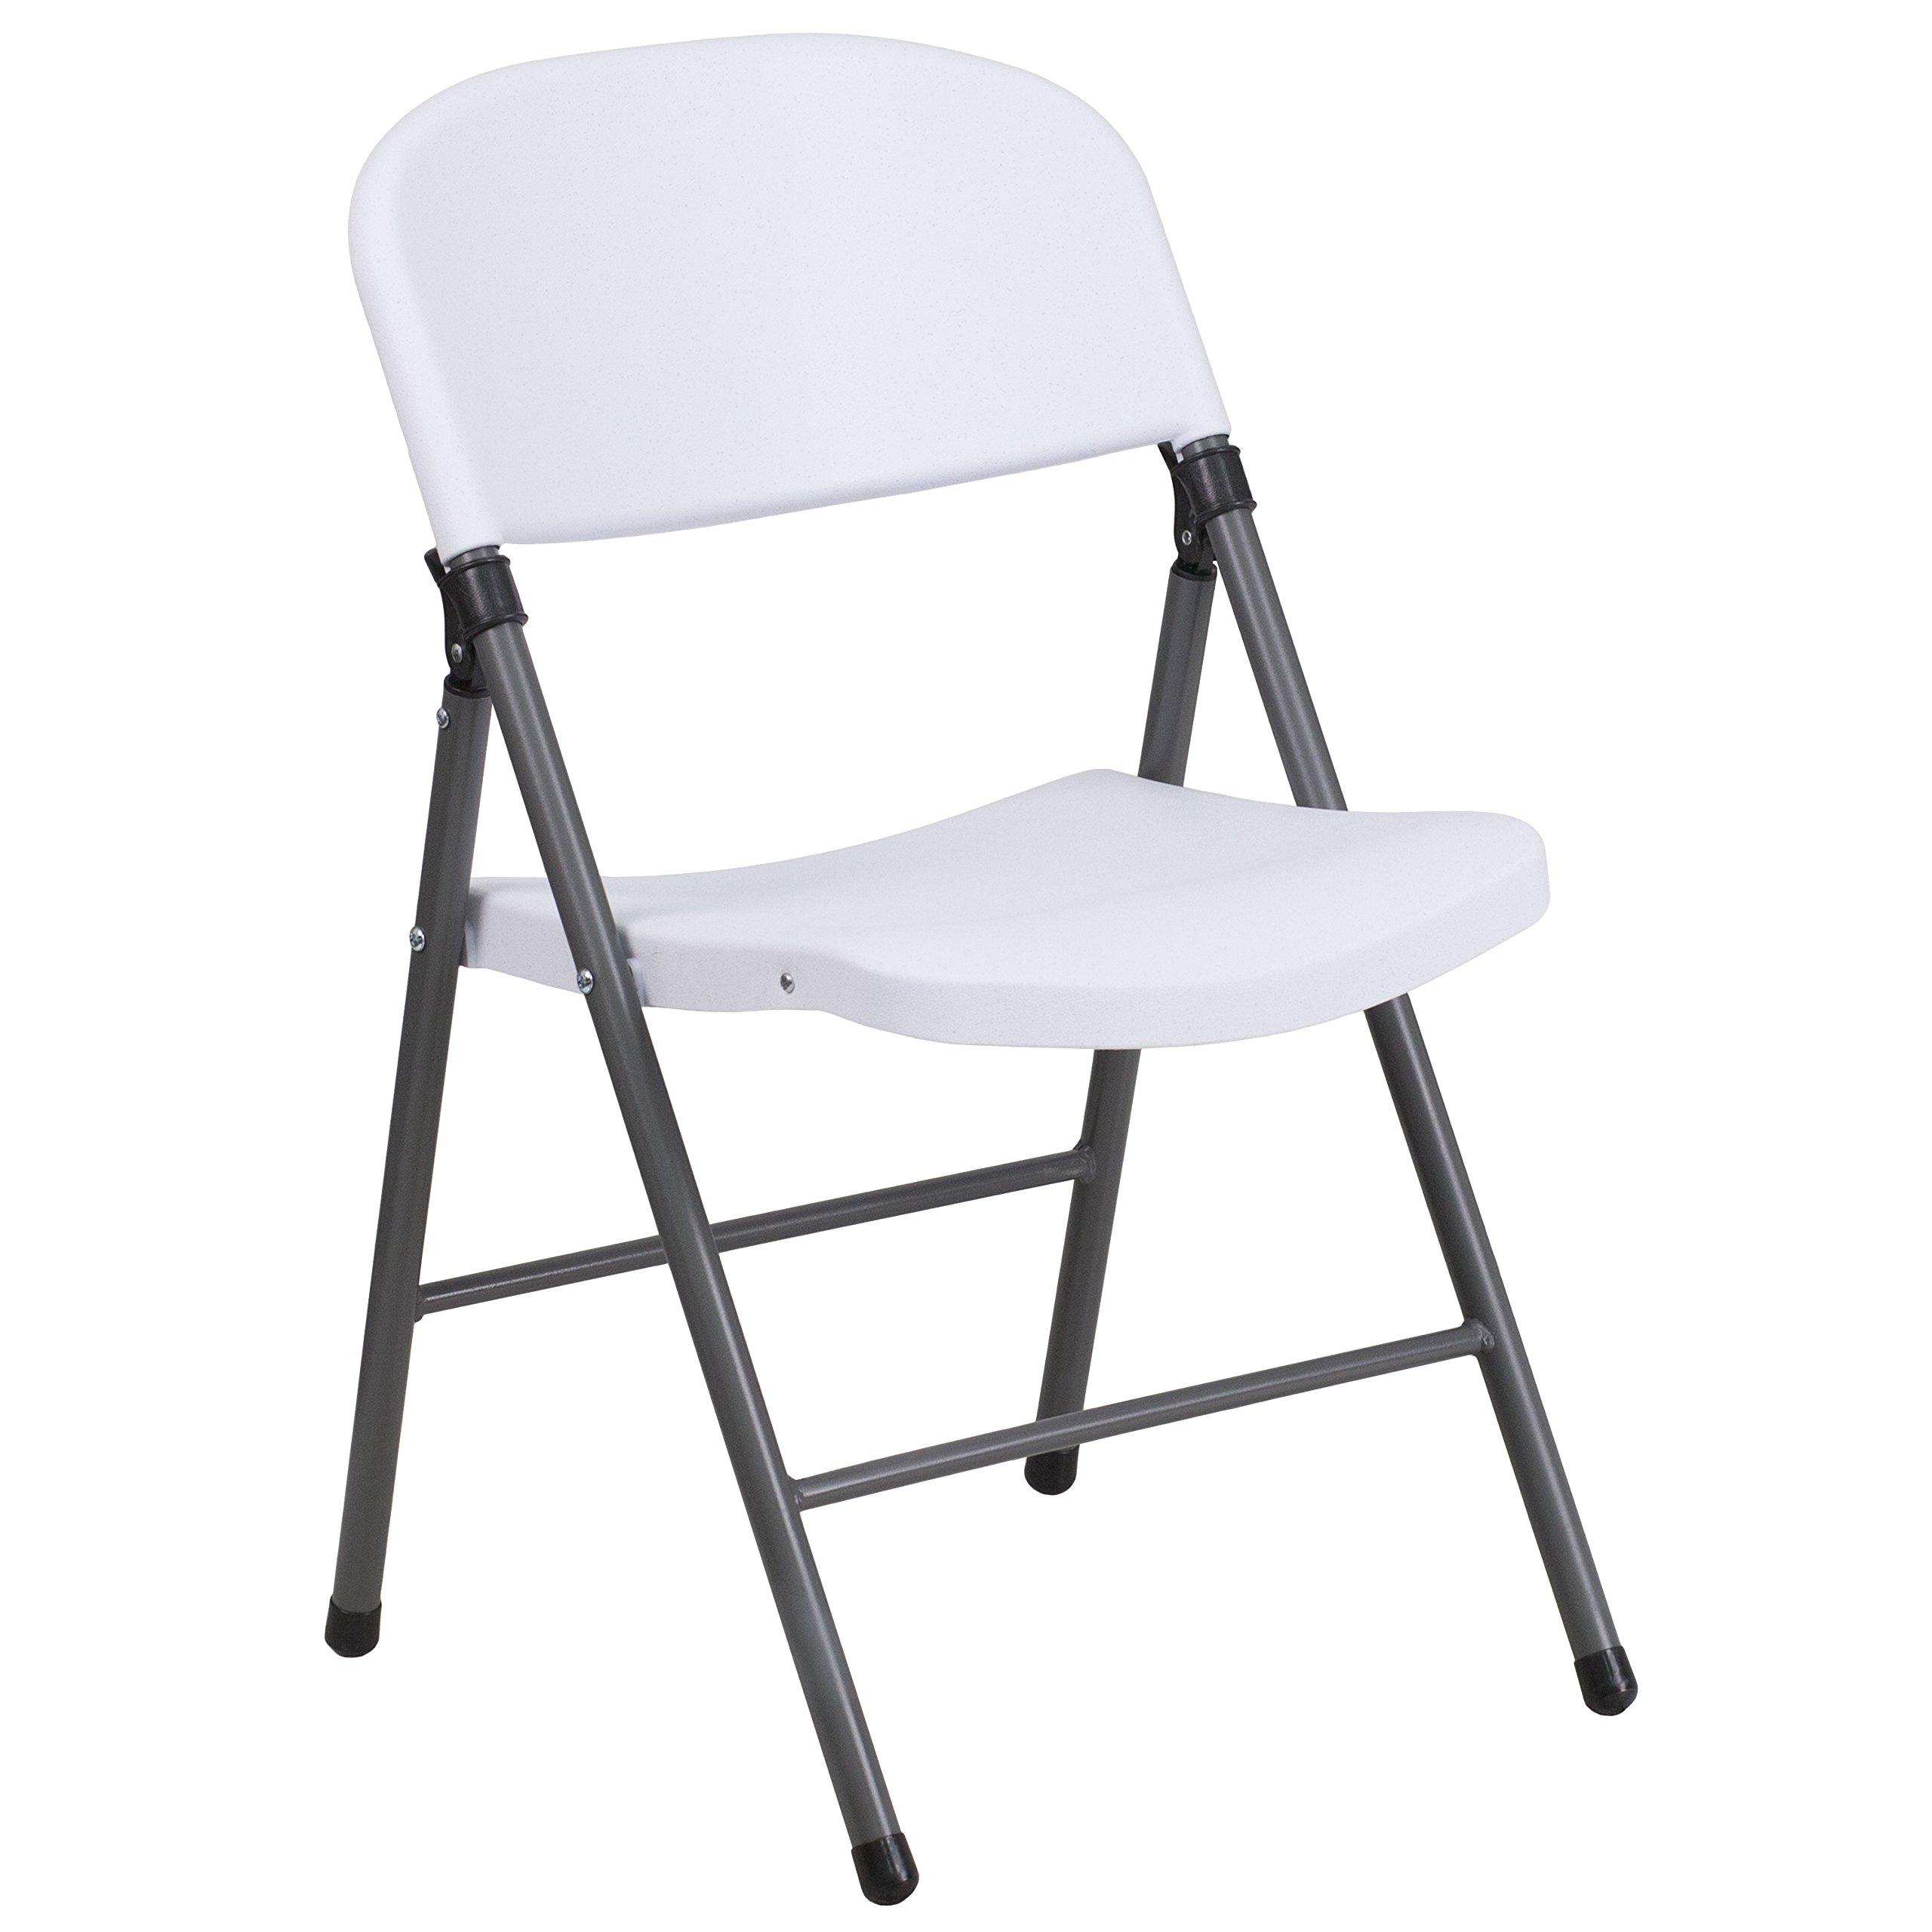 Plastic Chairs For Sale Amazon Com